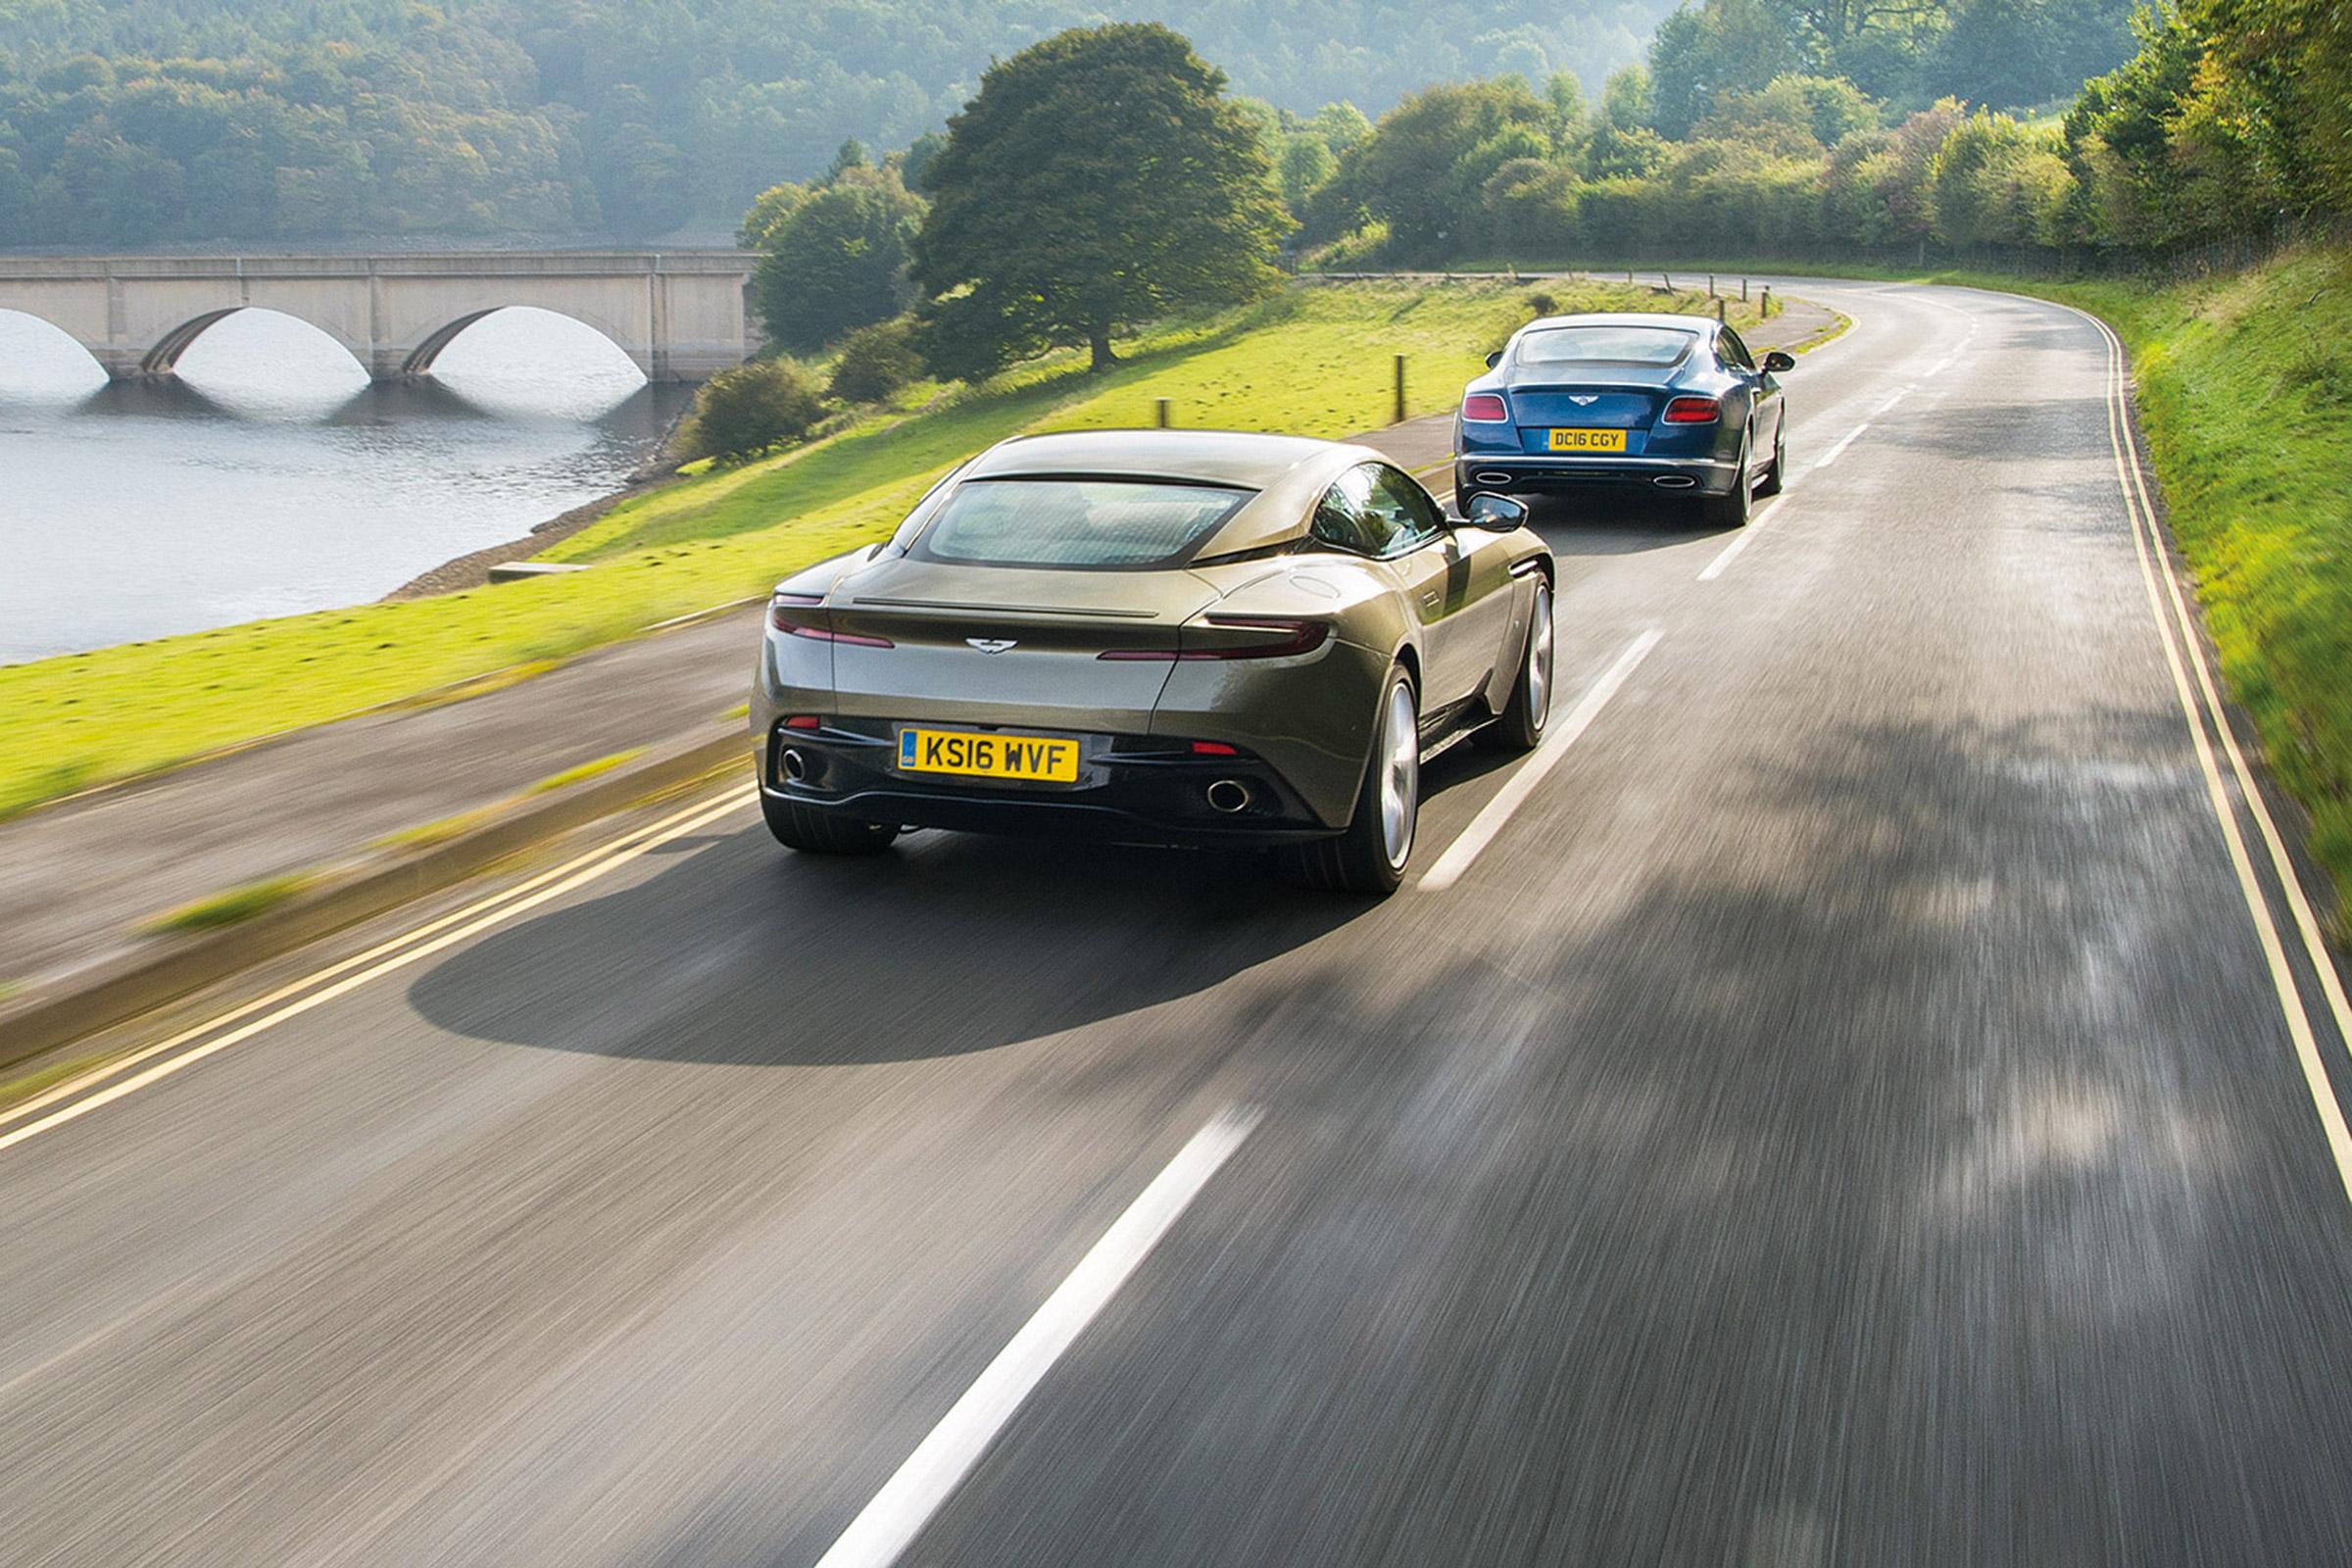 Aston Martin Db11 Vs Bentley Continental Gt Speed Evo